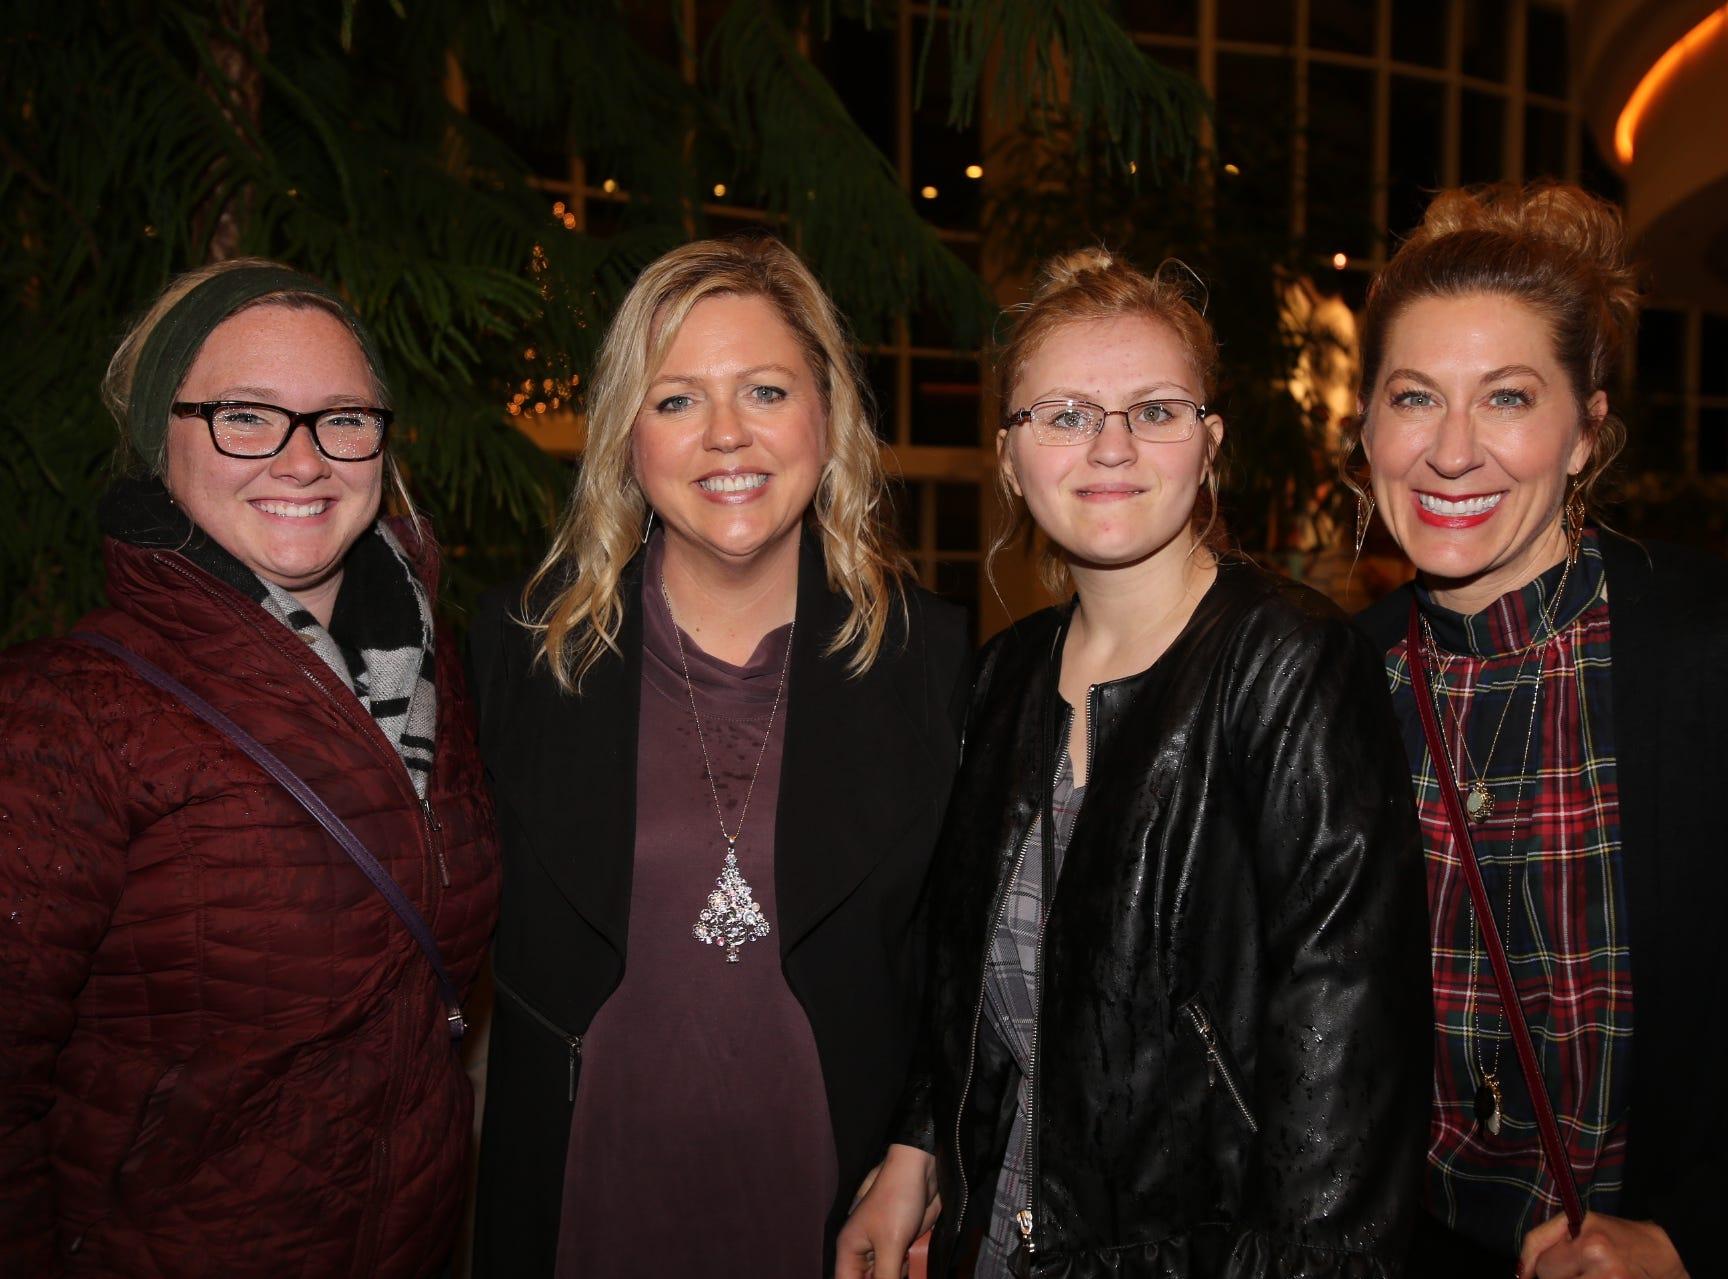 Katie, Nancy, and Annya Bogart and Lisa Schwarz